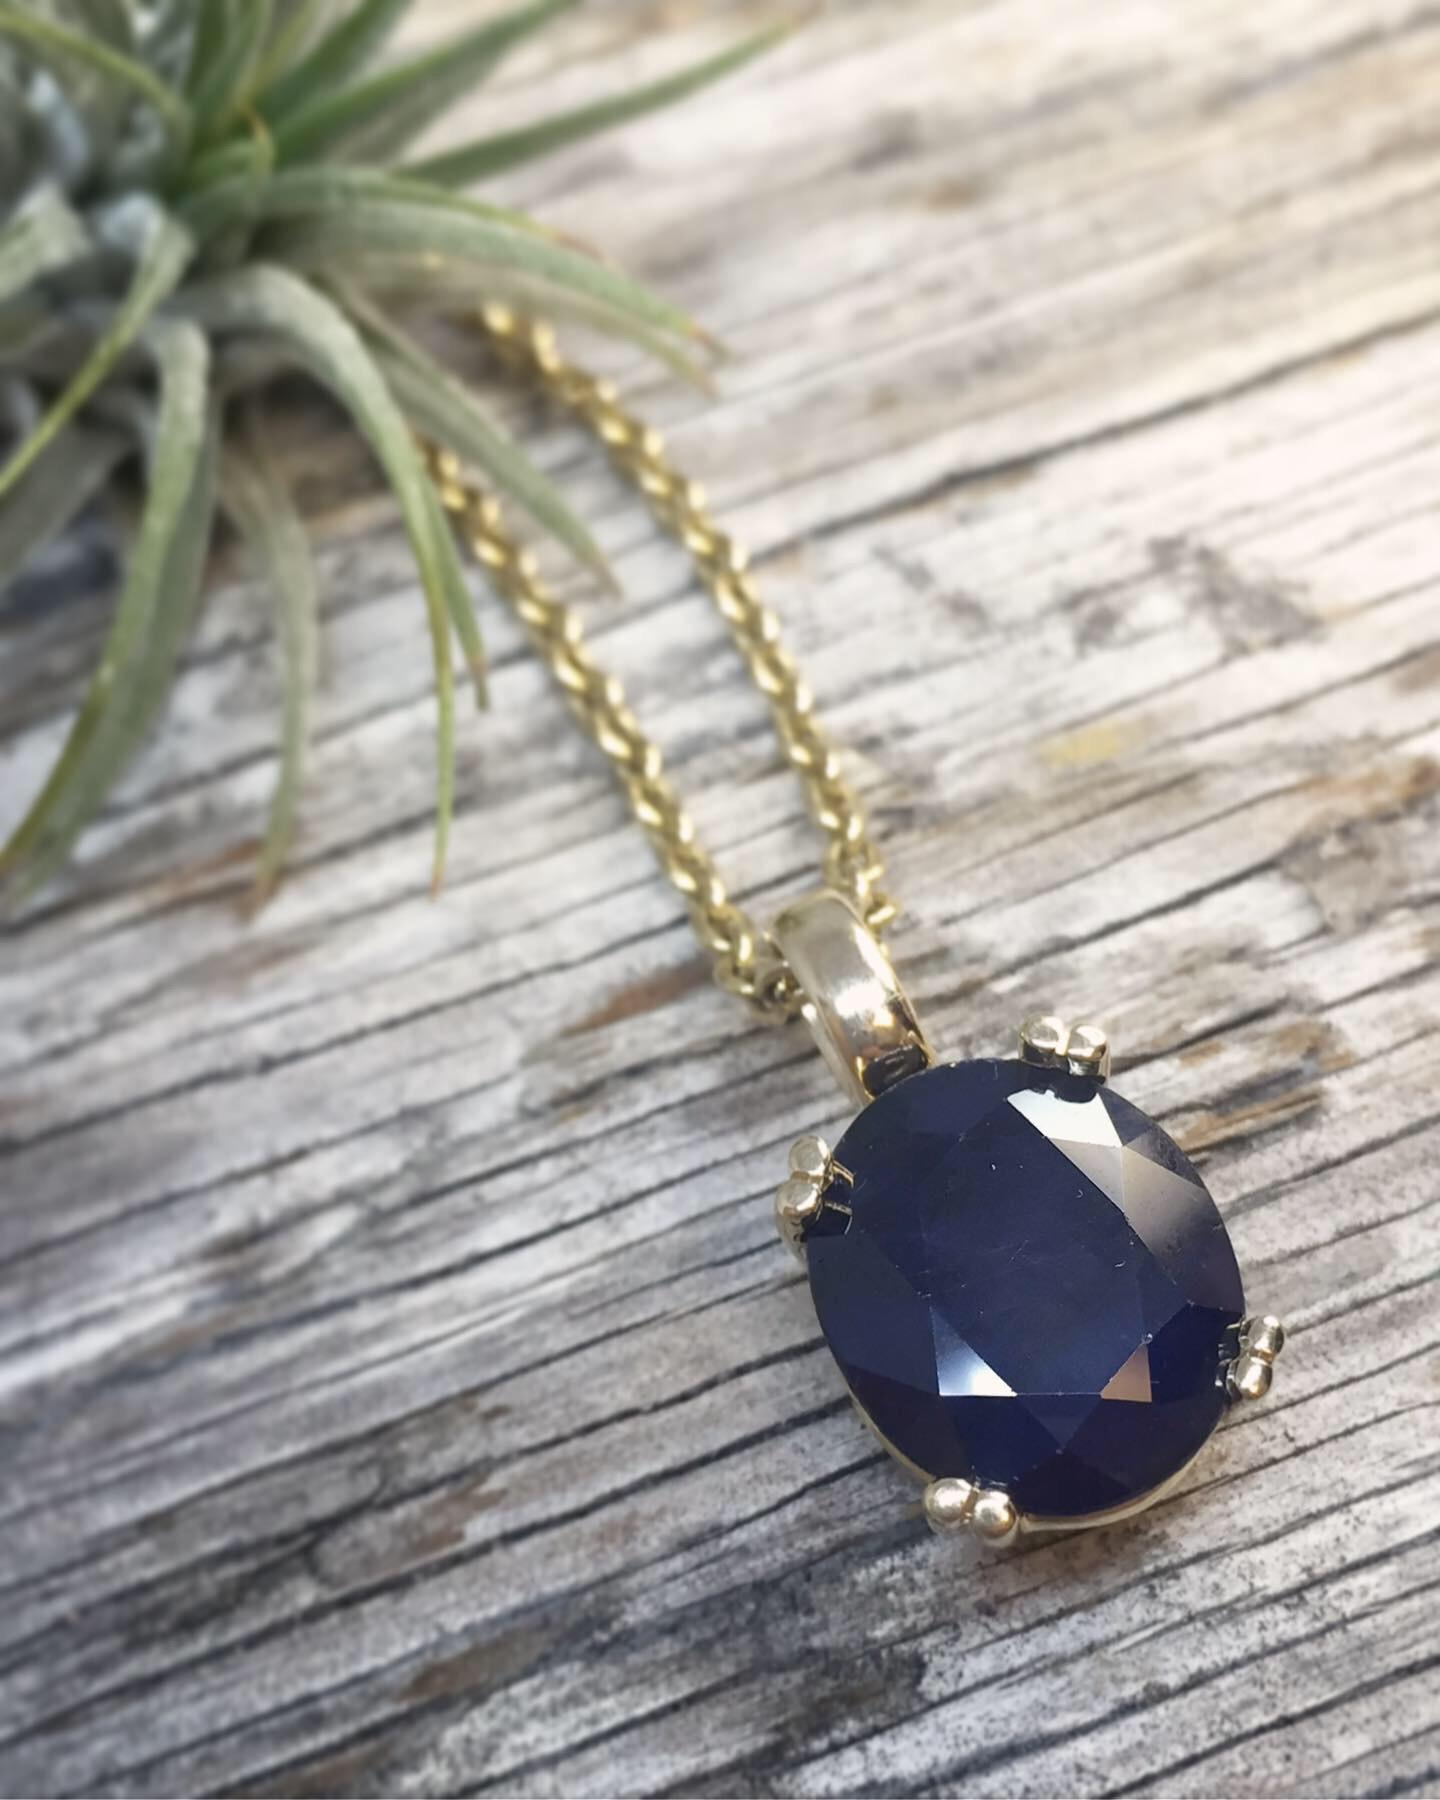 vancouver-jewelry-sapphire-gold-pendant-claw-verena strigler.jpg